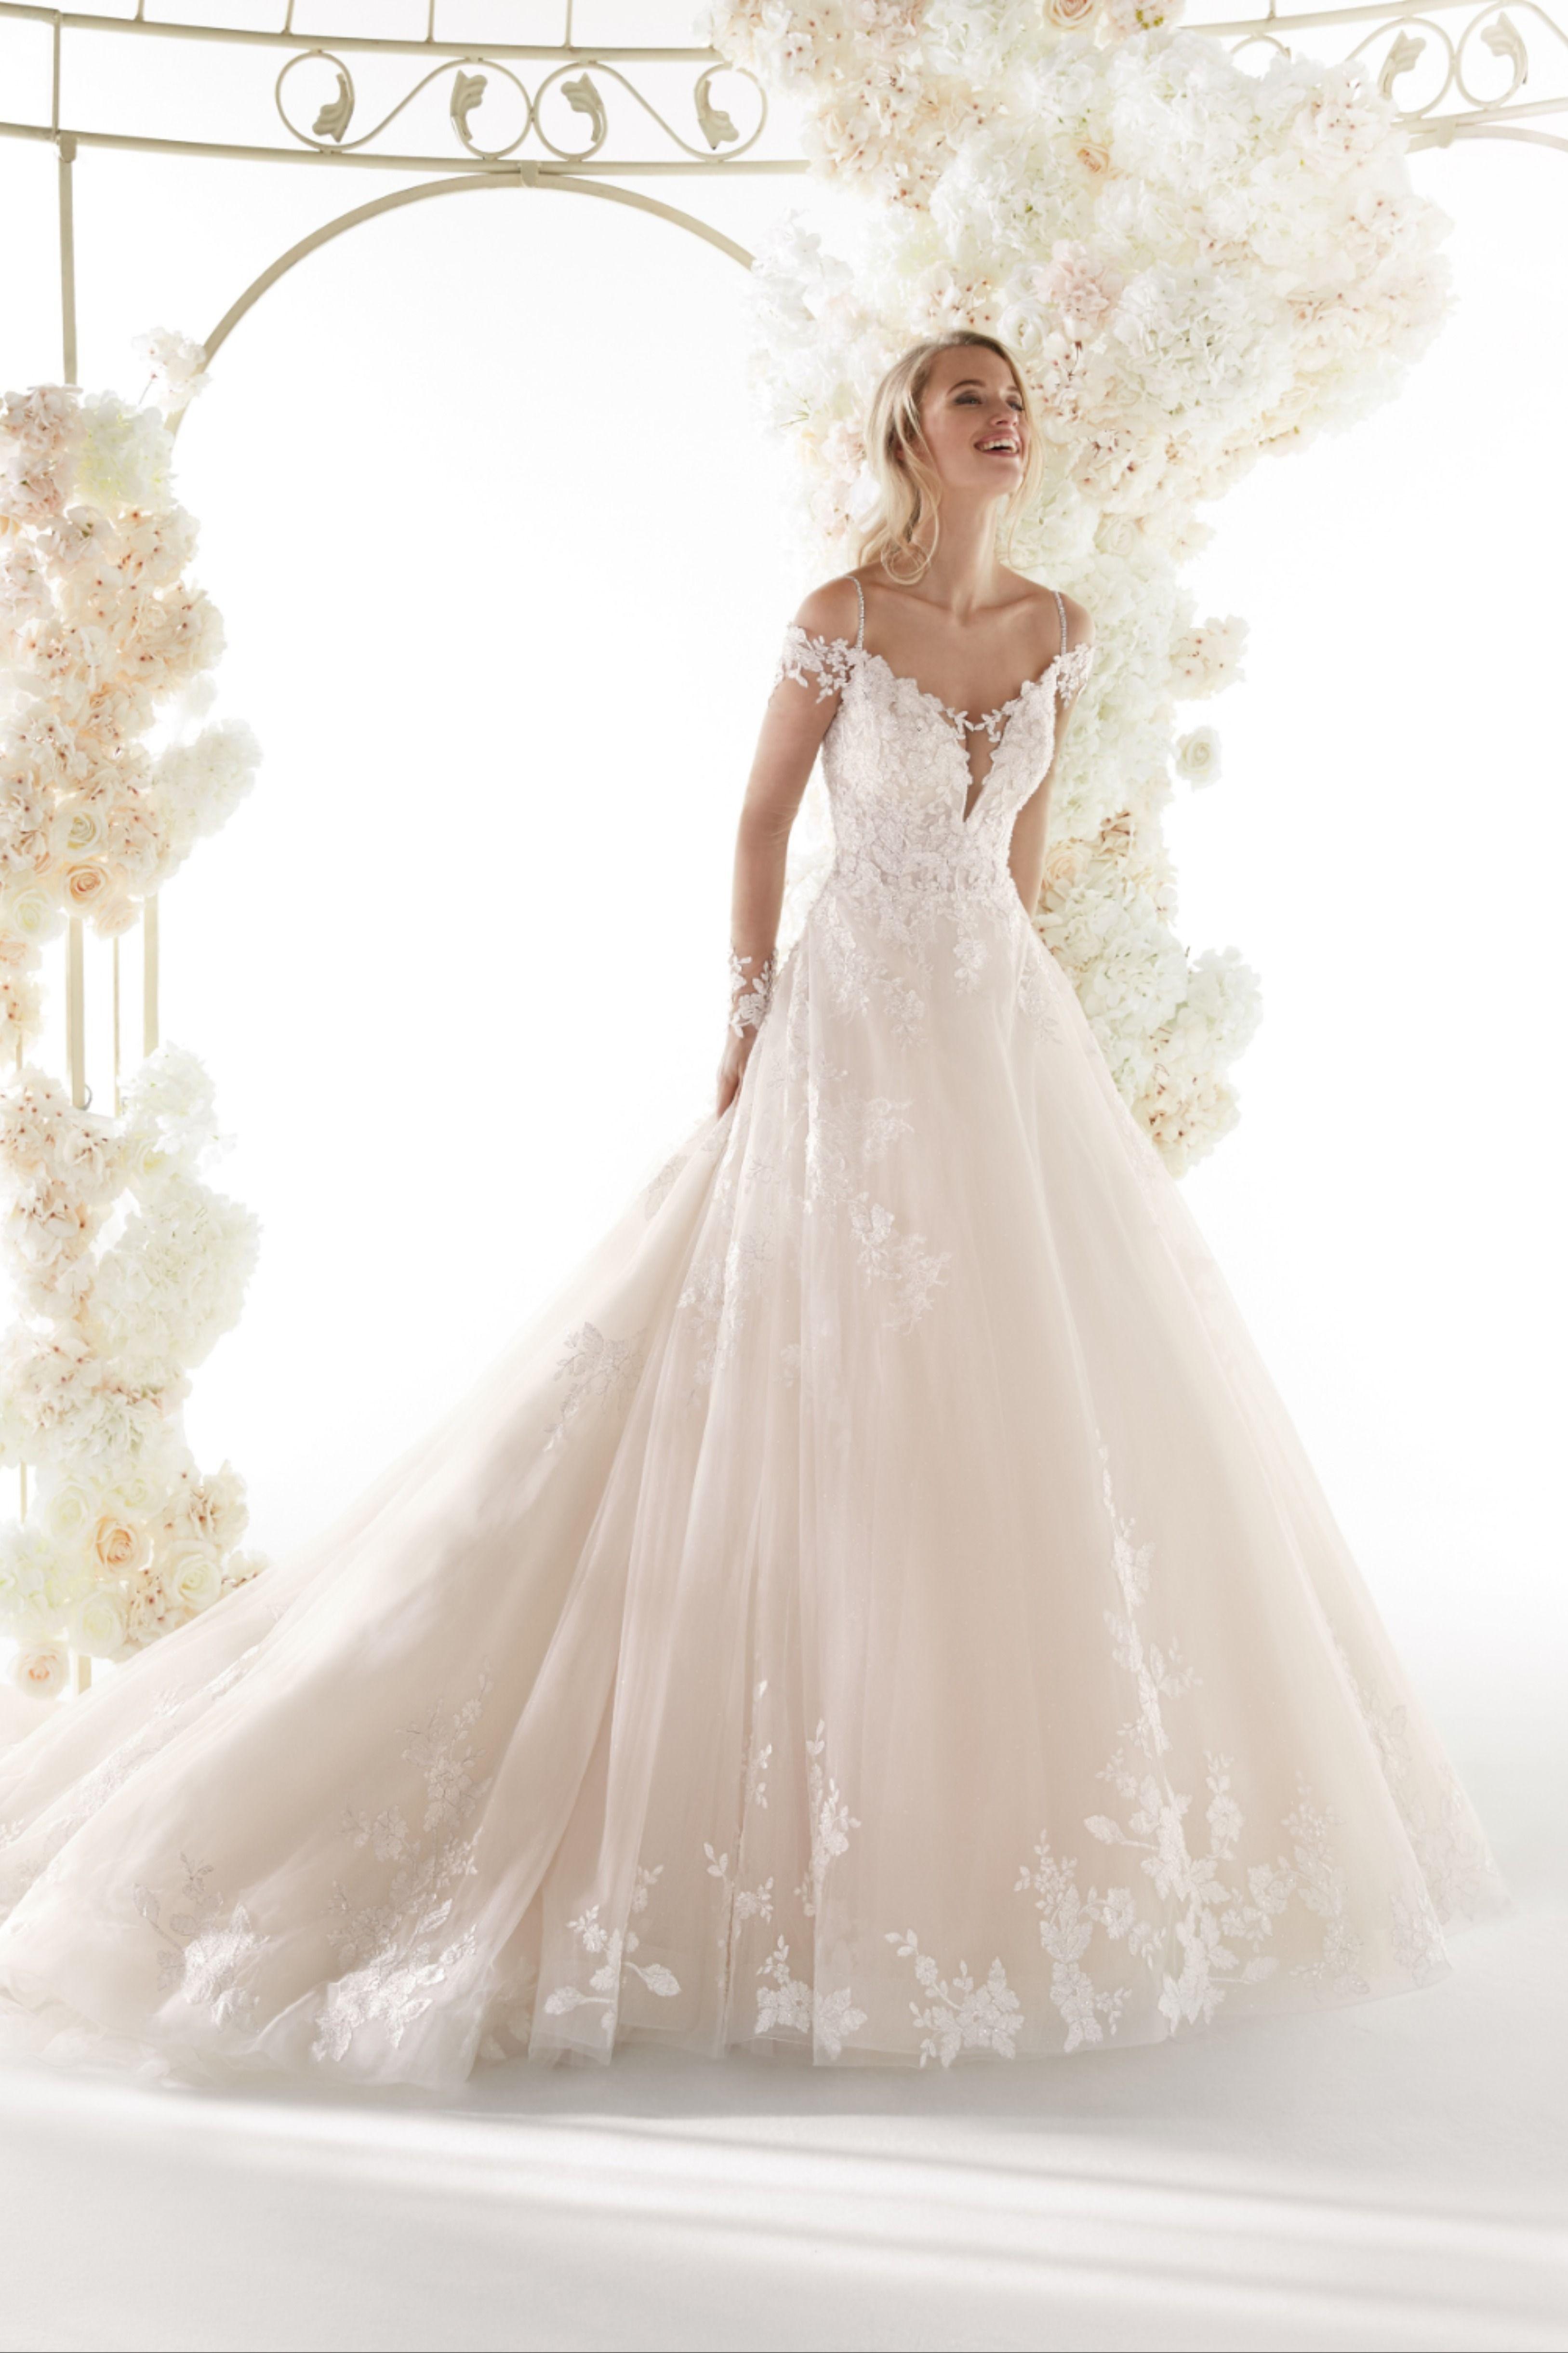 Hochzeitskleid  Brautkleid, Hochzeitskleid, Braut